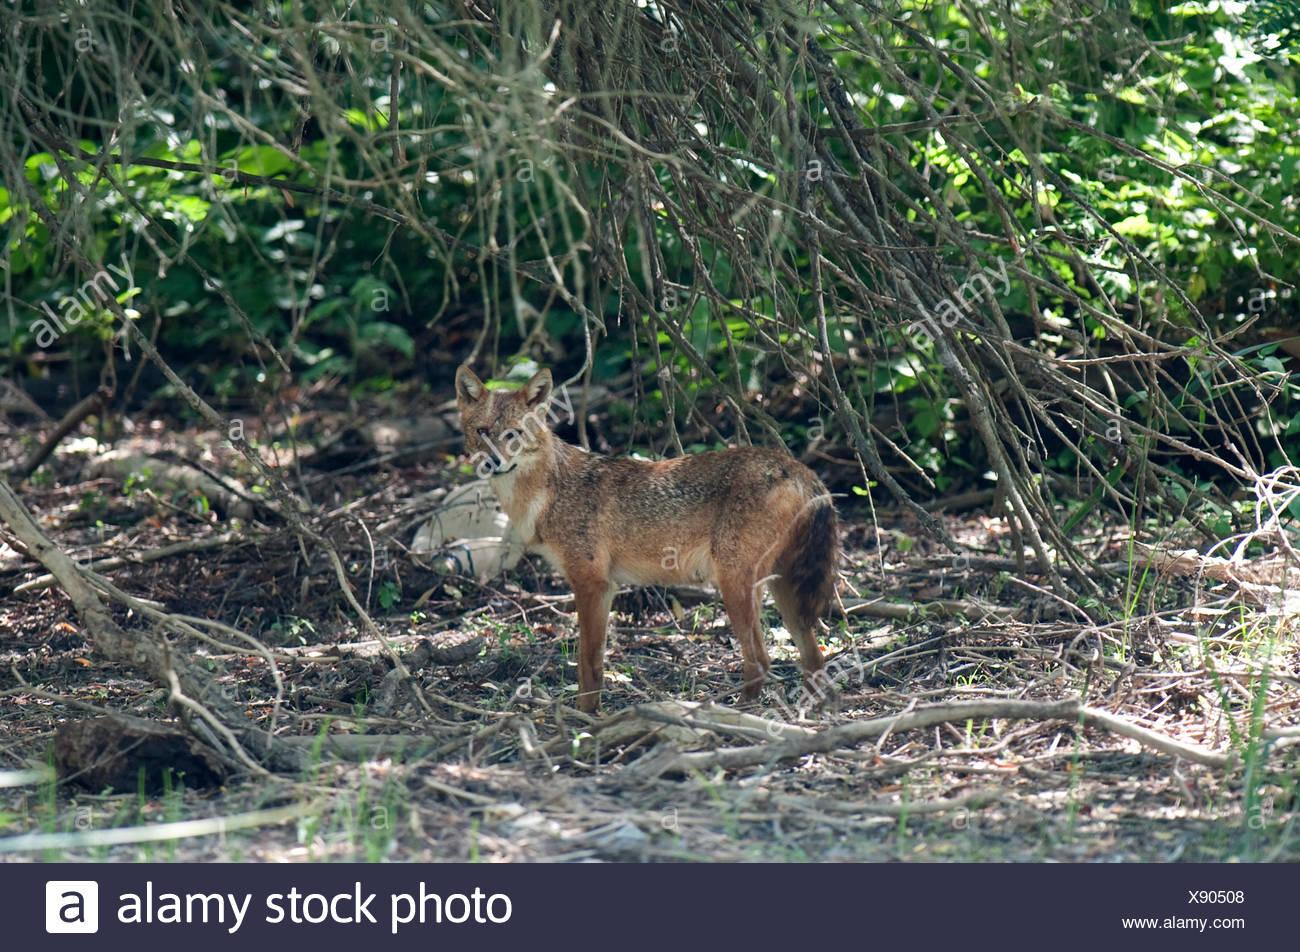 European Jackal, Canis aureus moreoticus, Danube Delta, Romania, Caucasian jackal or reed wolf, subspecies of golden jackal native to Southeast Europe Stock Photo